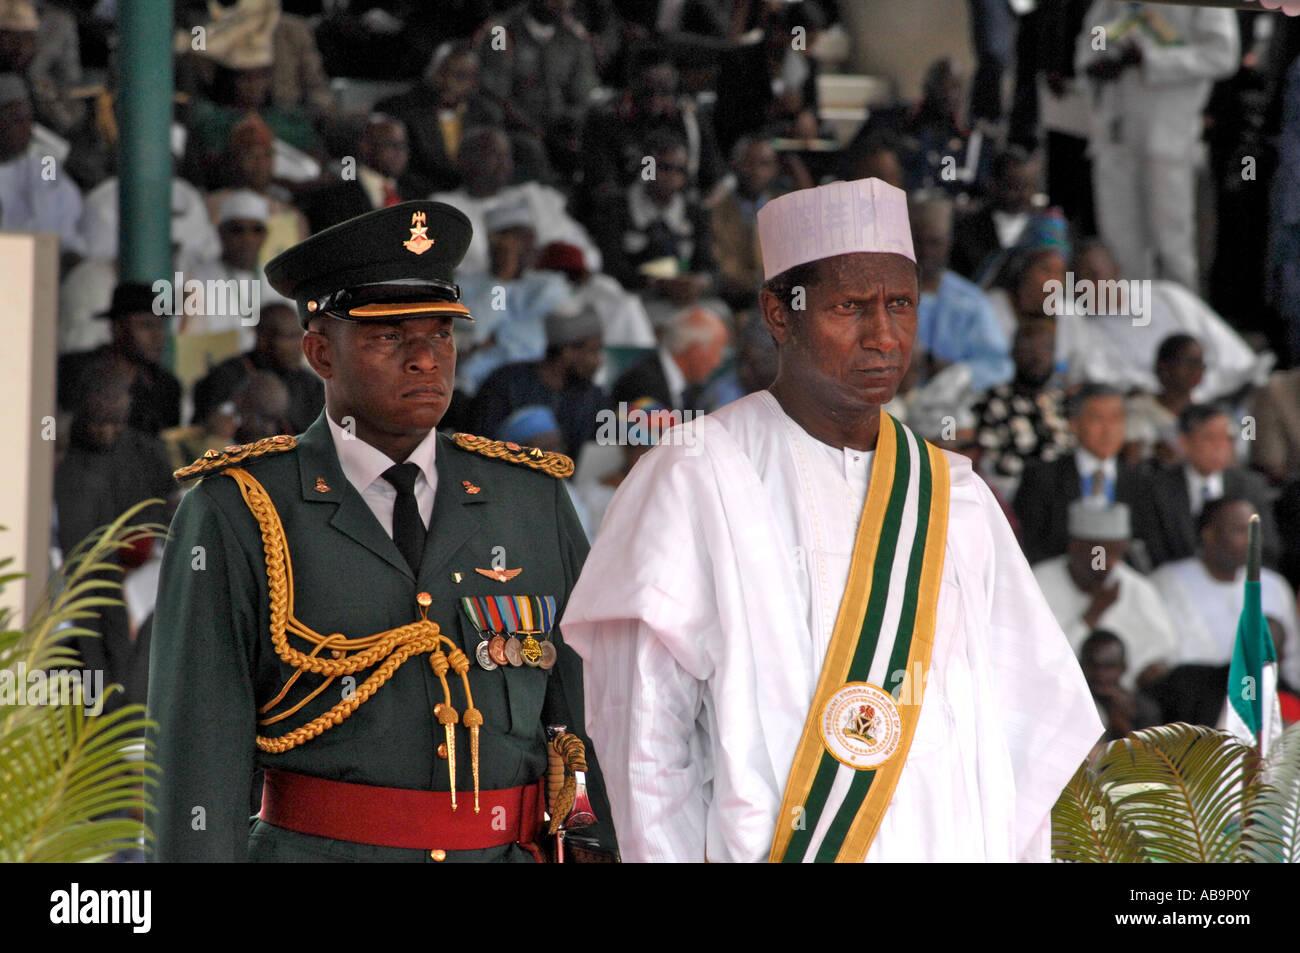 Inauguration of Umaru Musa Yar Adua as the new President of Nigeria Abuja 29 May 2007. - Stock Image